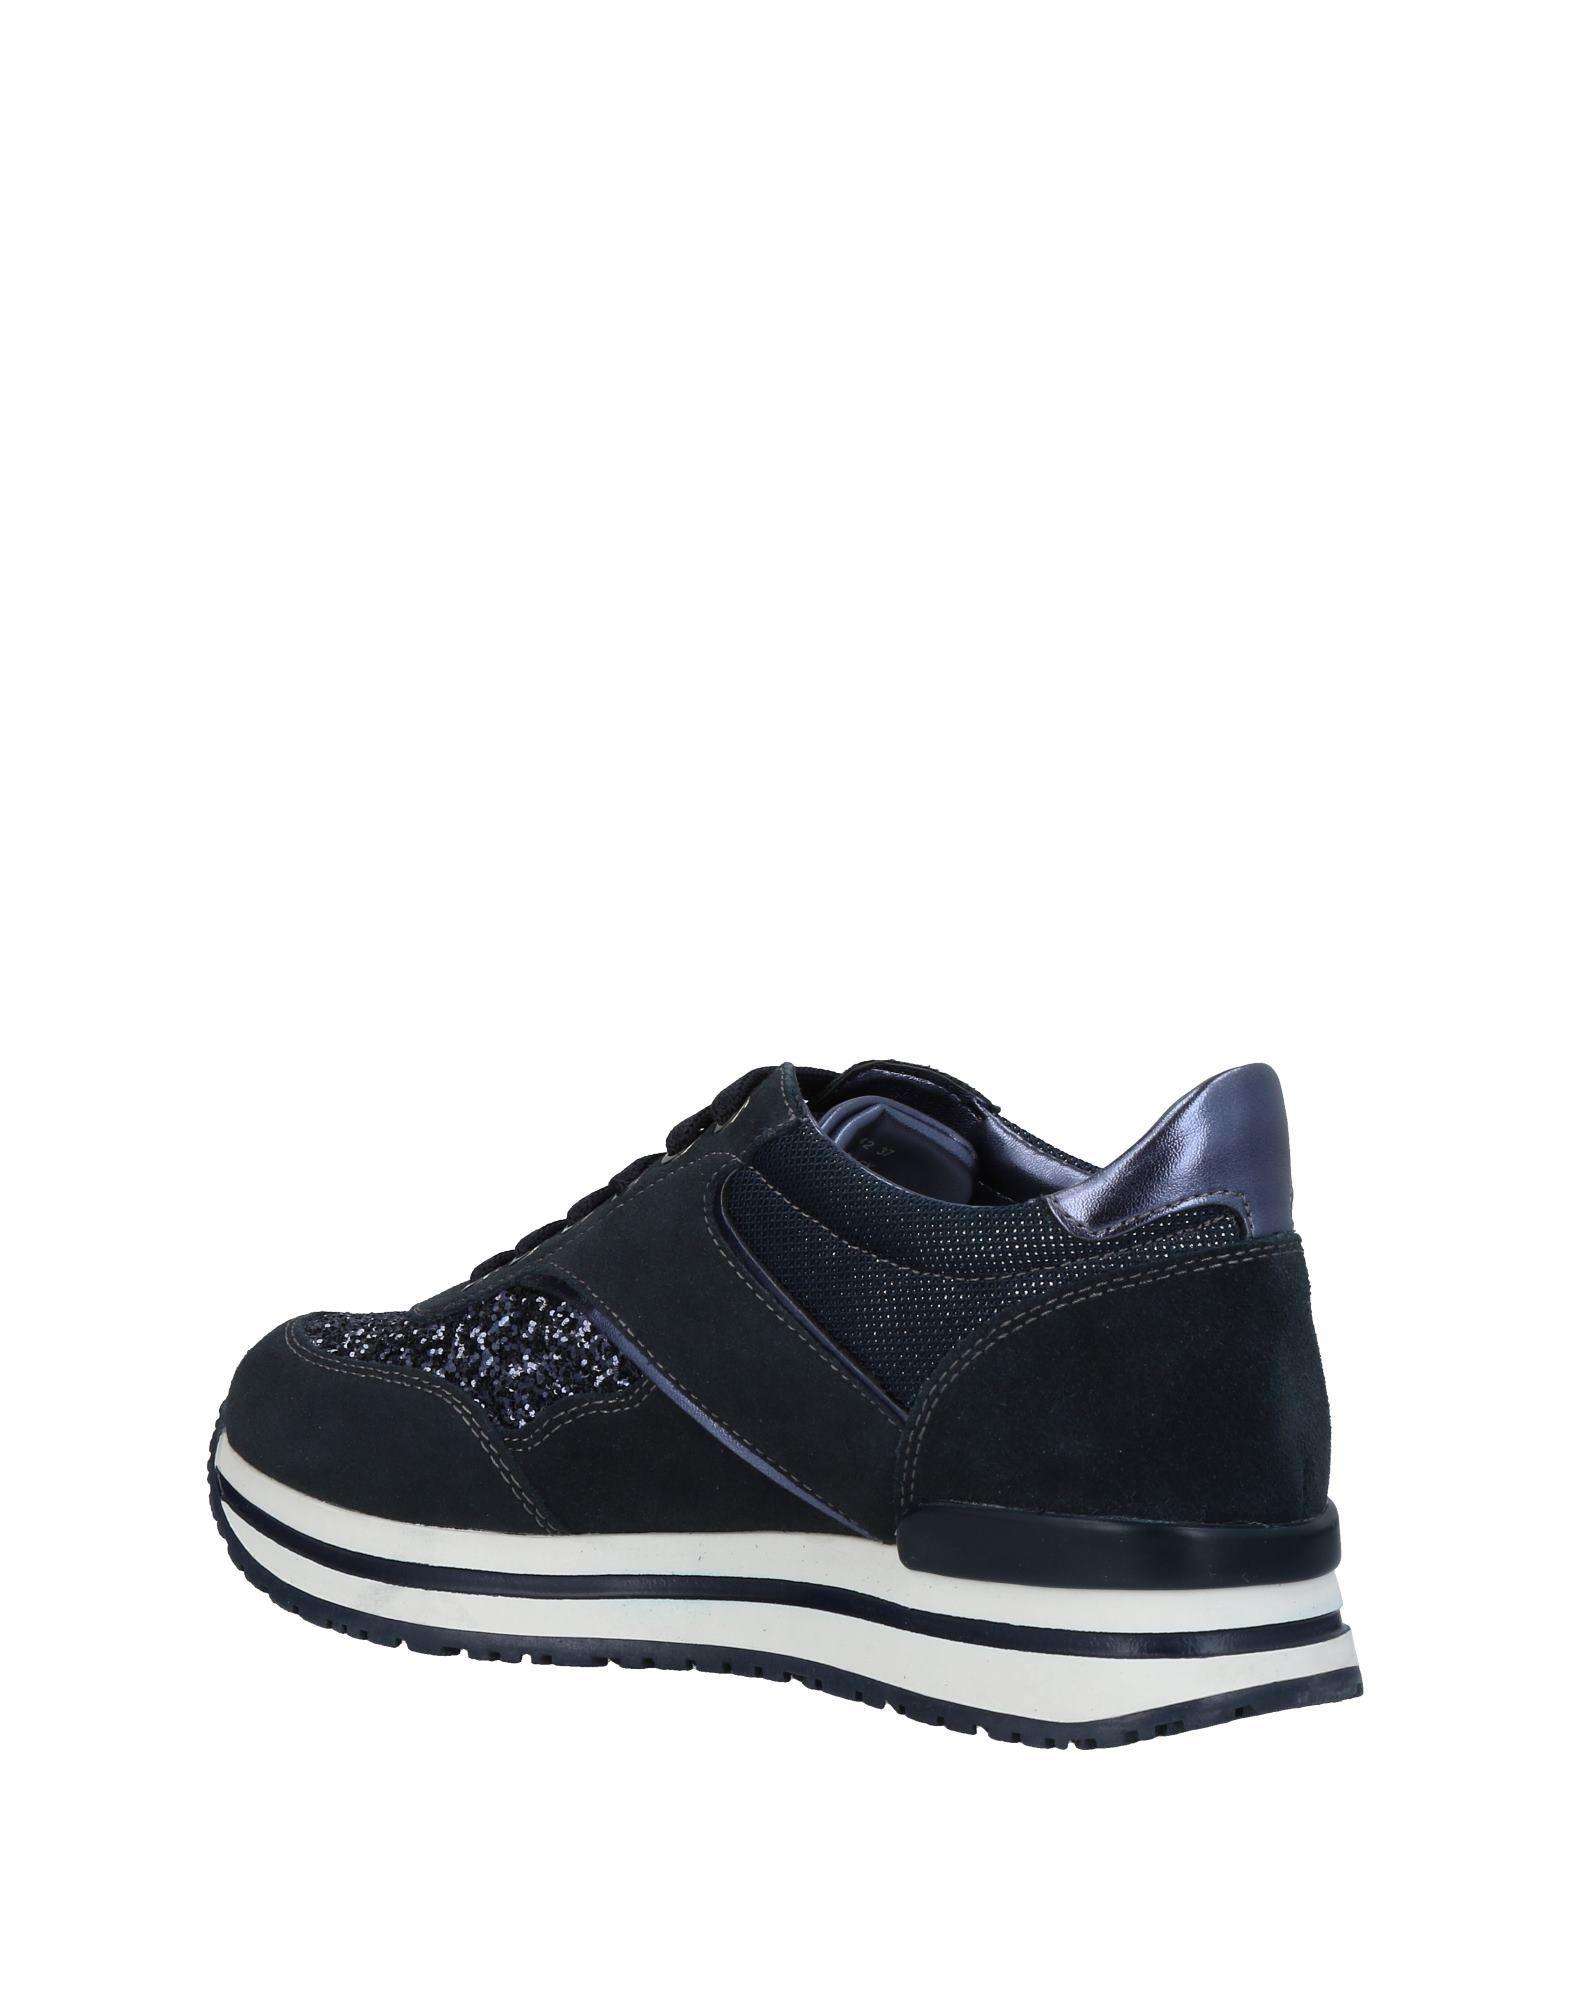 Sneakers & Tennis basses Cuir Lumberjack en coloris Bleu pZy5